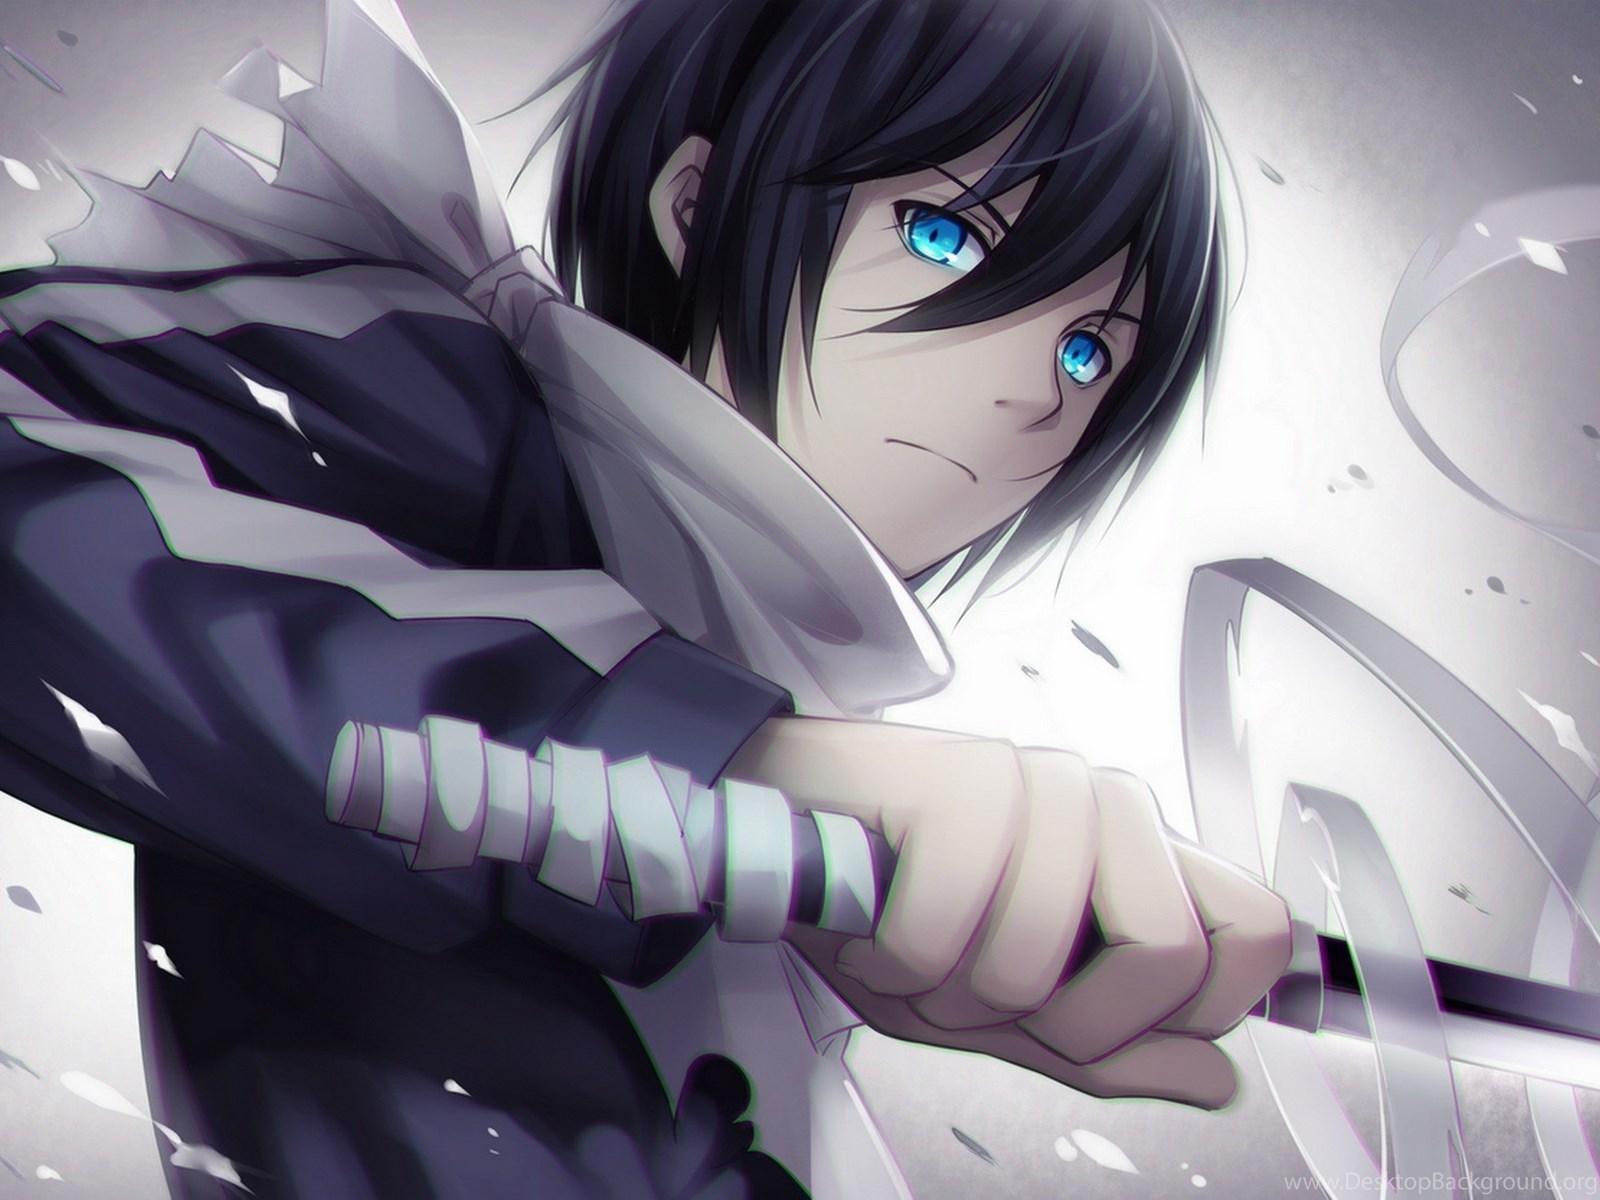 Anime Handsome Cute Boy Desktop Backgrounds HD Wallpapers Large